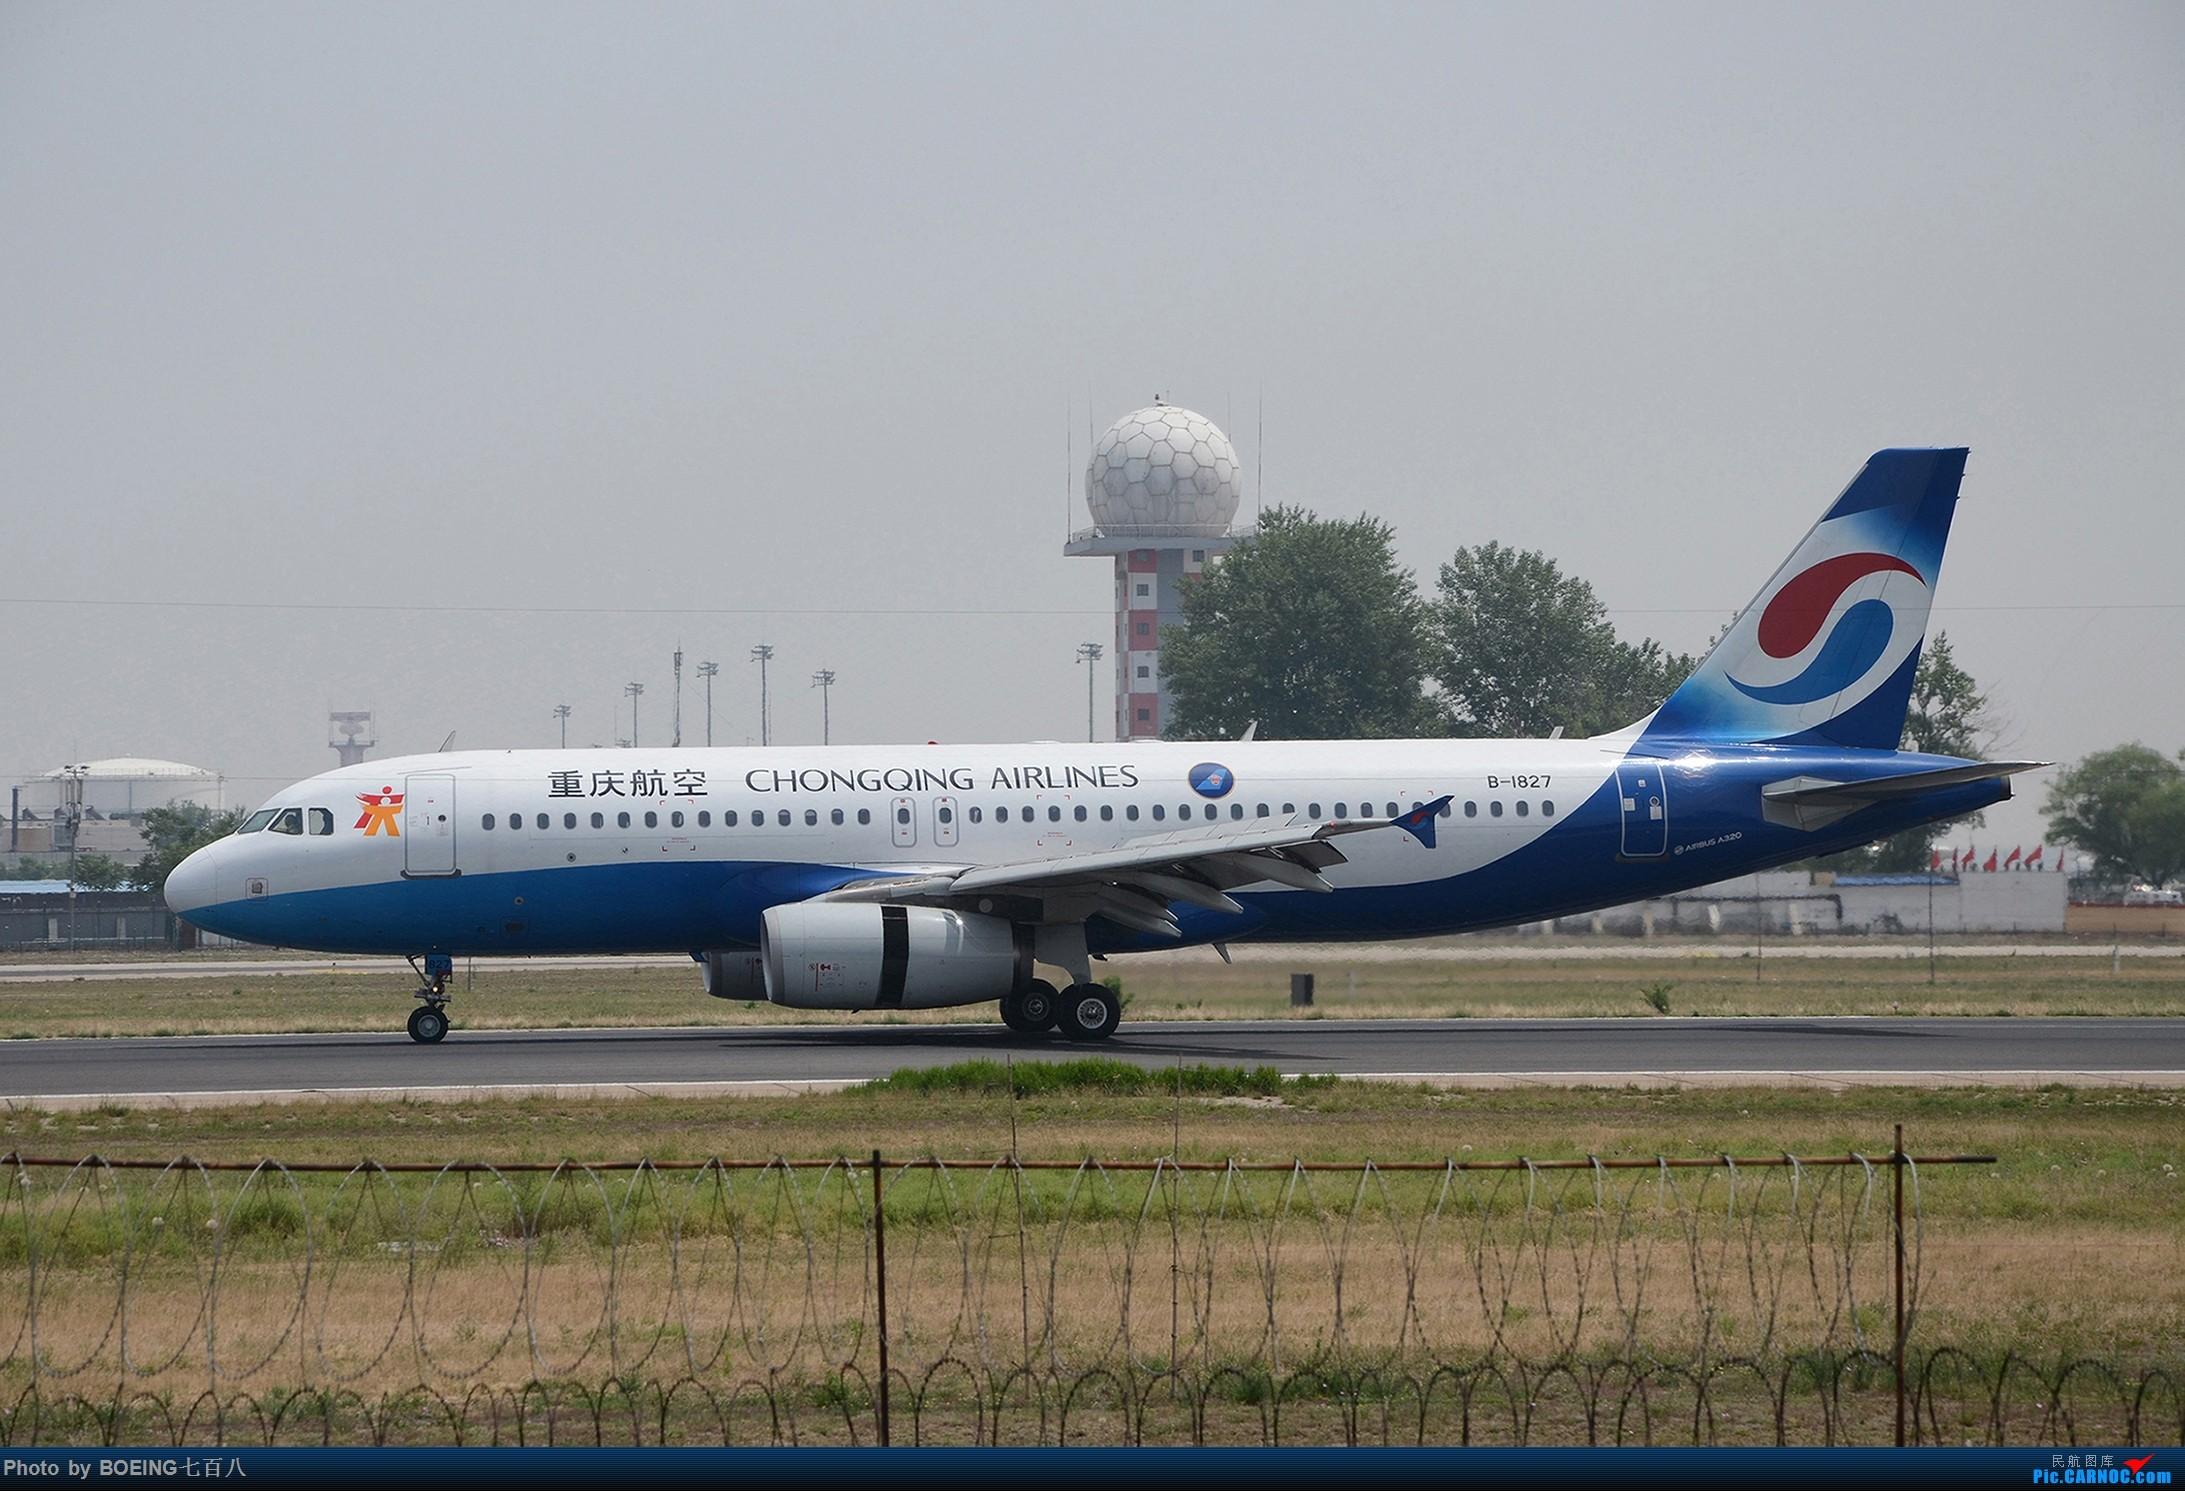 Re:[原创]海航家的黄焖熊猫和清蒸熊猫等好货 AIRBUS A320-200 B-1827 中国北京首都国际机场